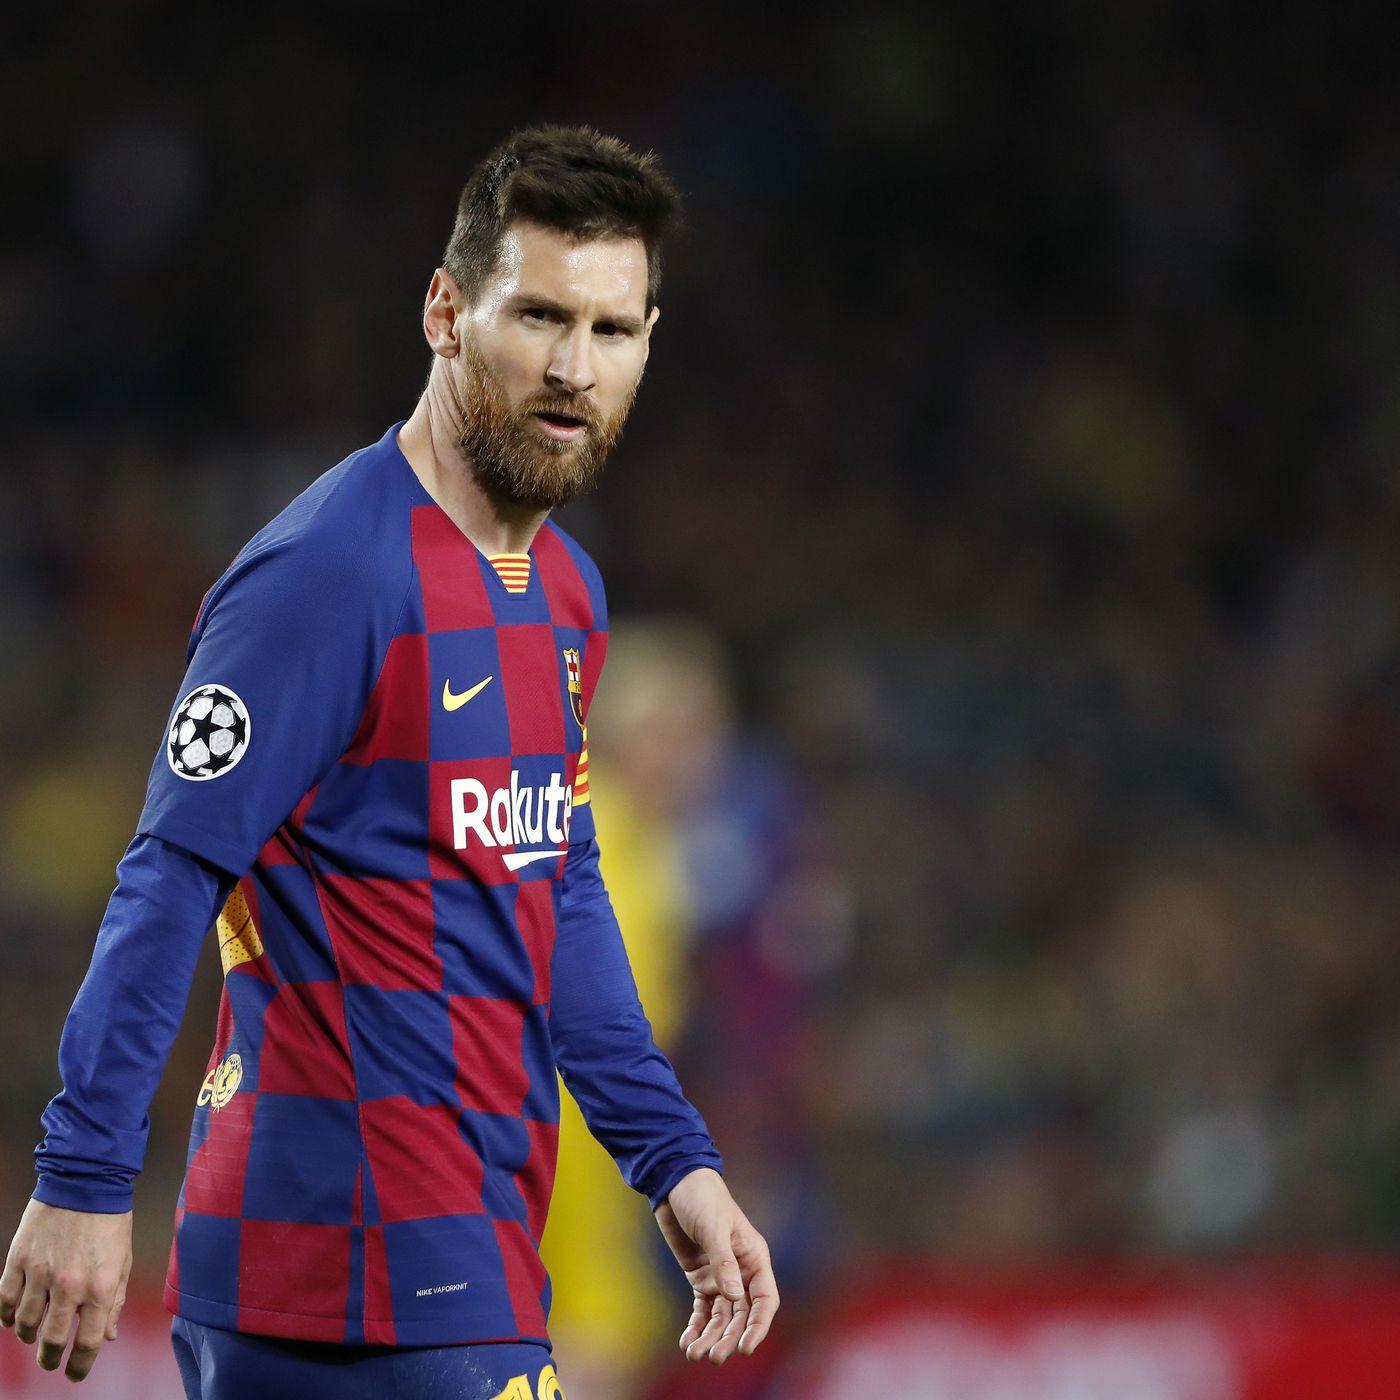 Barcelona Vs Napoli Champions League Team News Preview Lineups Score Prediction Barca Blaugranes